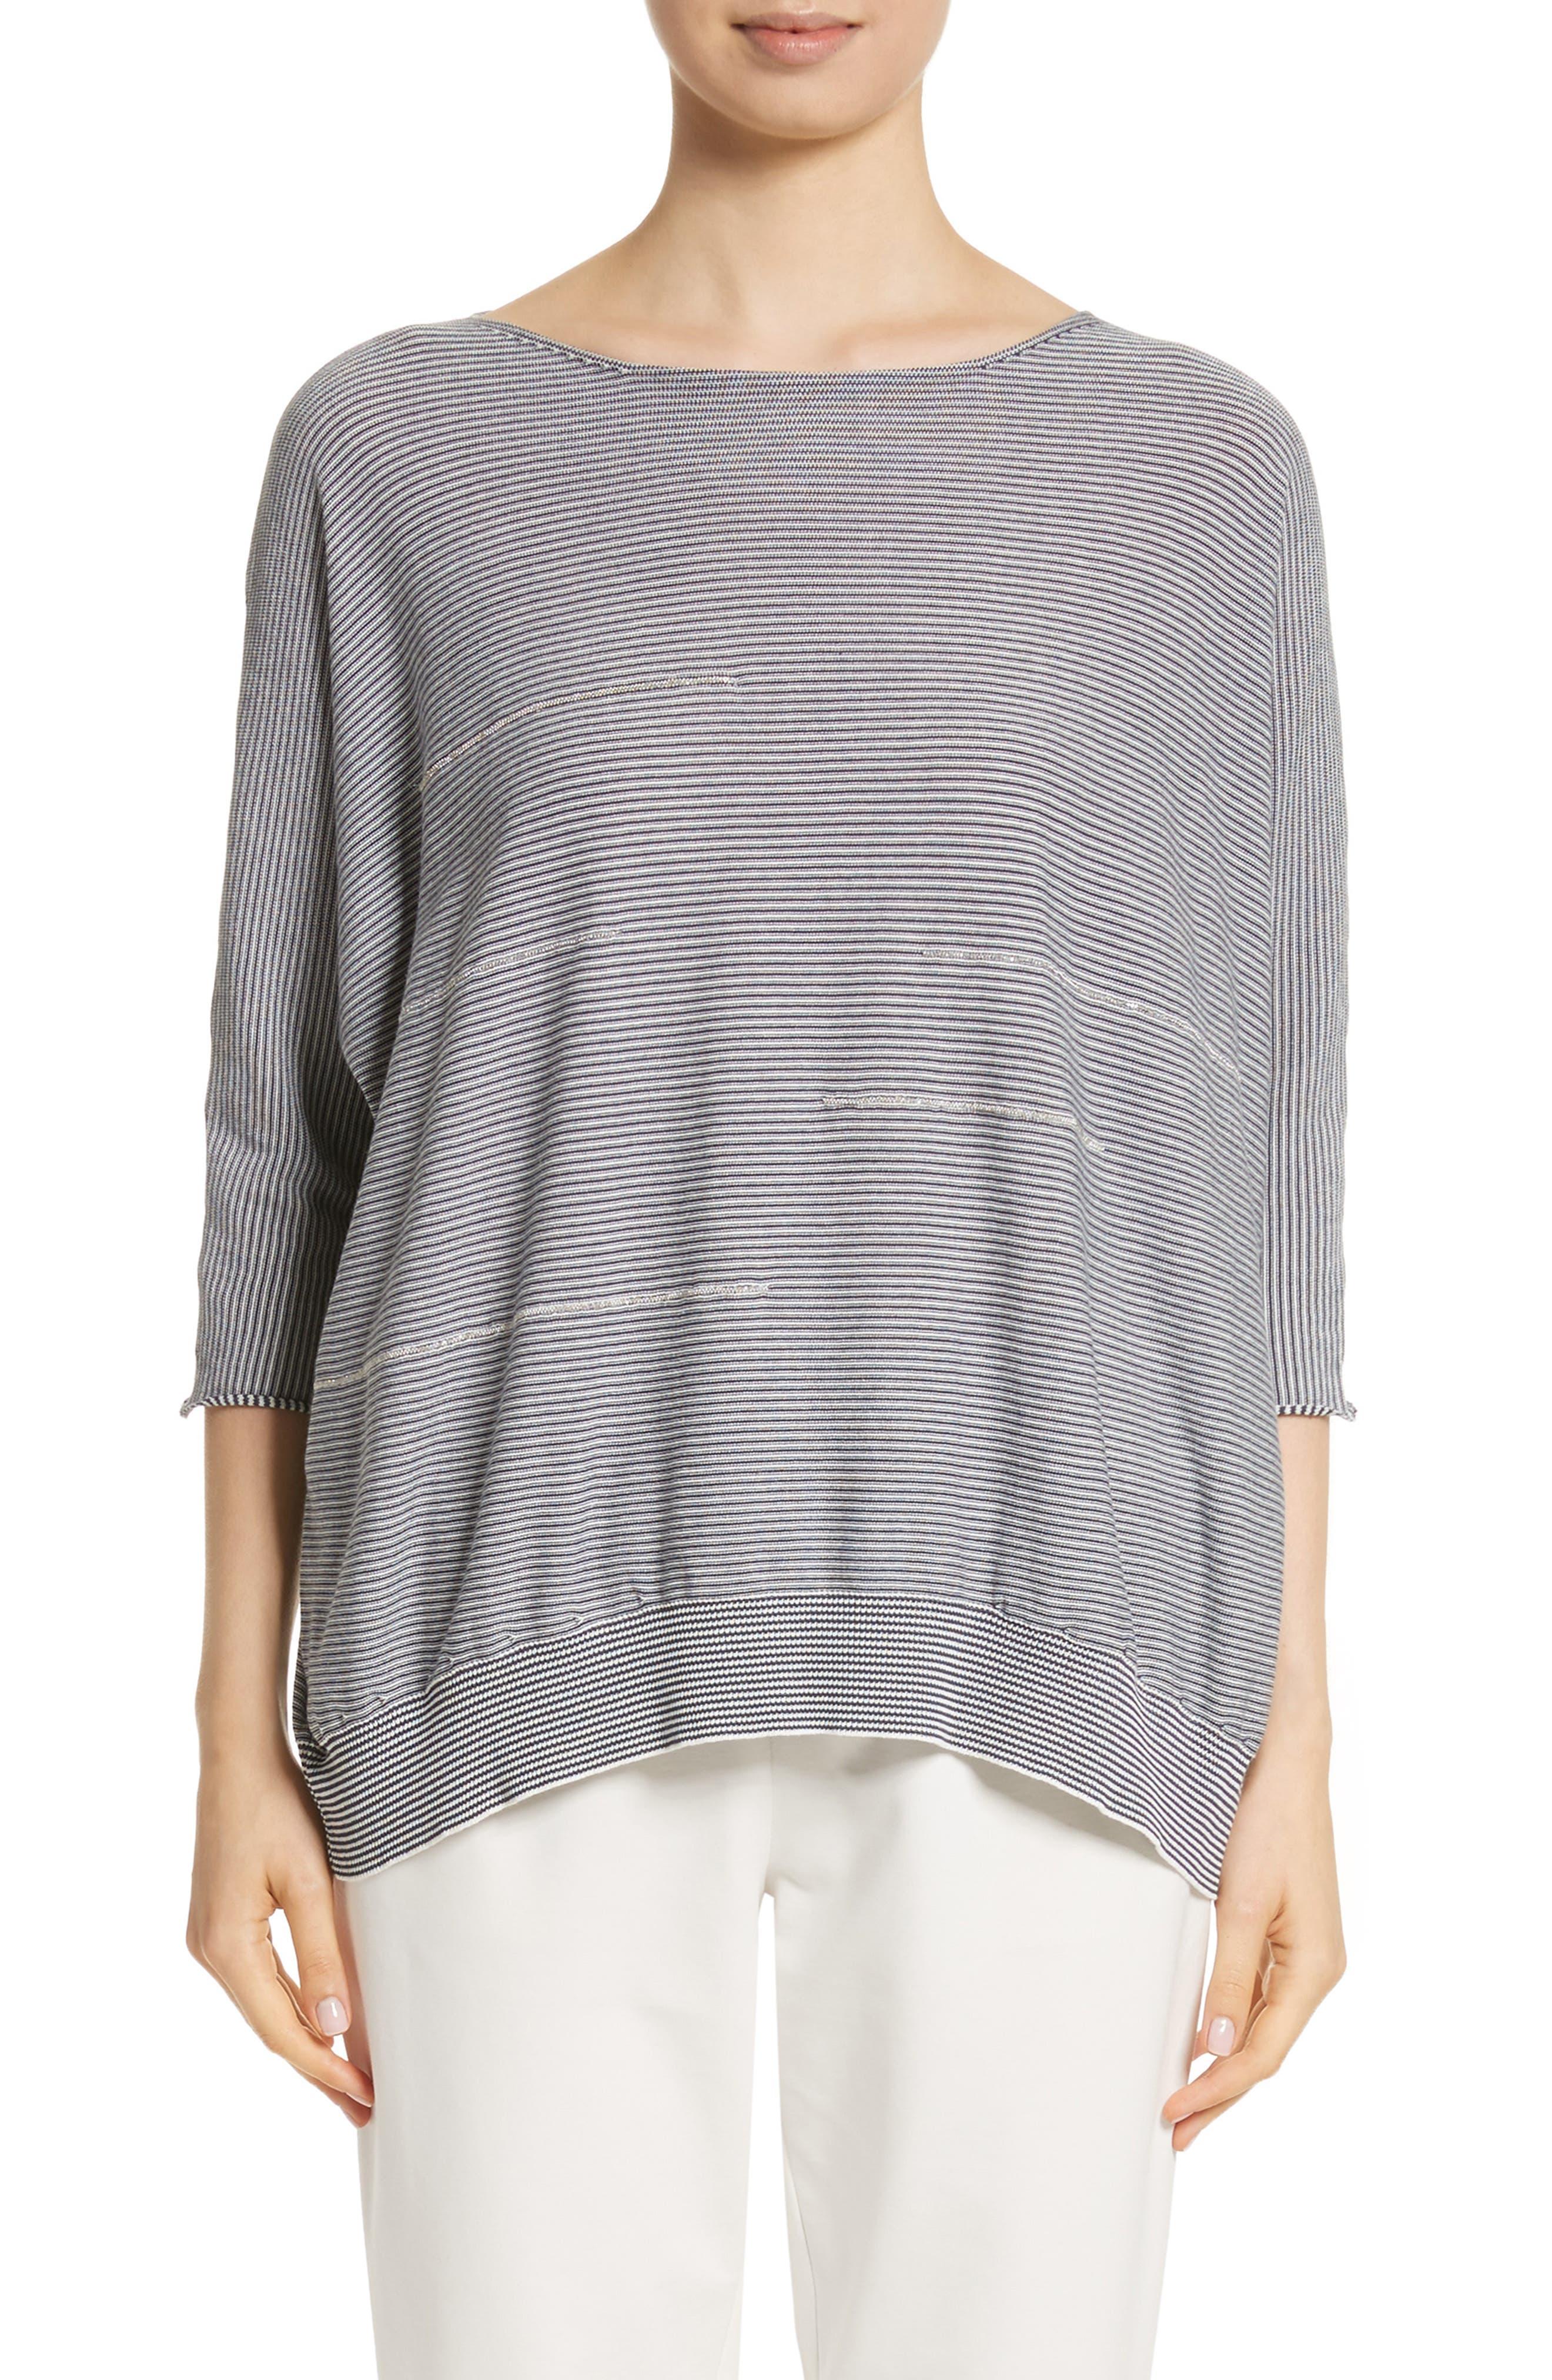 Fabiana Filippi Embellished Stripe Knit Cotton Top